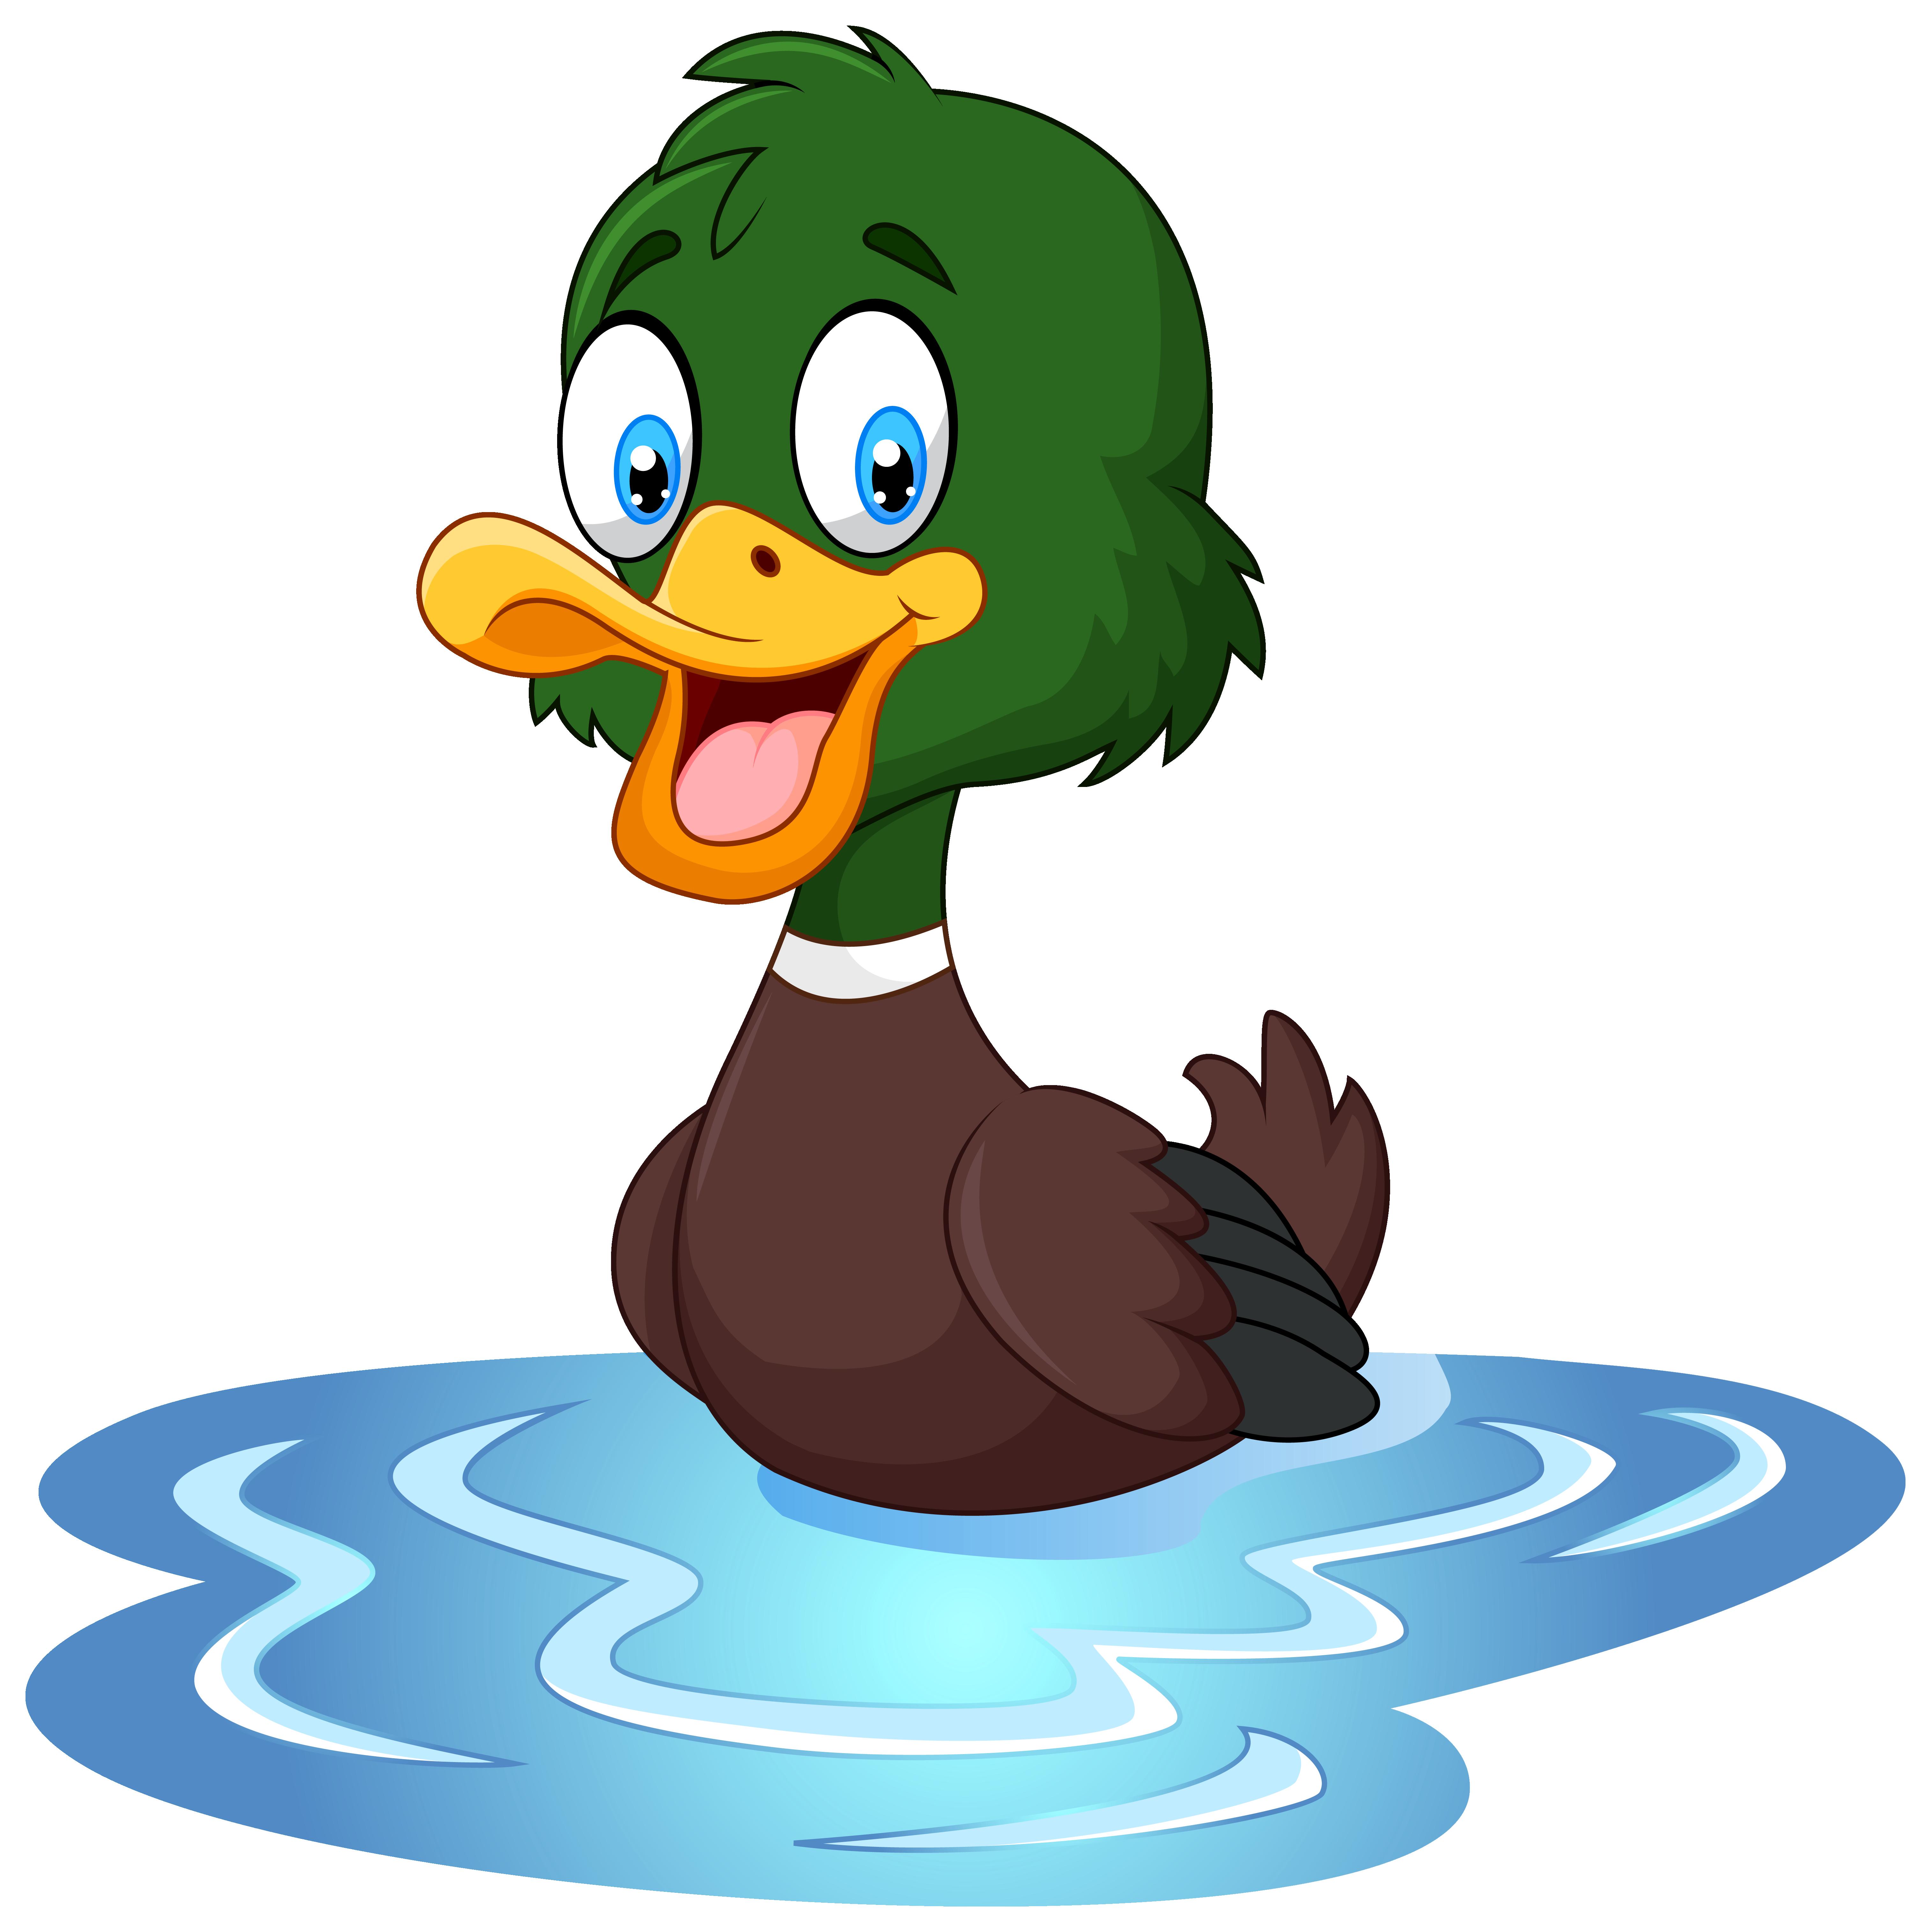 Cute winter duck clipart clip black and white download Free Duck Clipart, Download Free Clip Art, Free Clip Art on ... clip black and white download